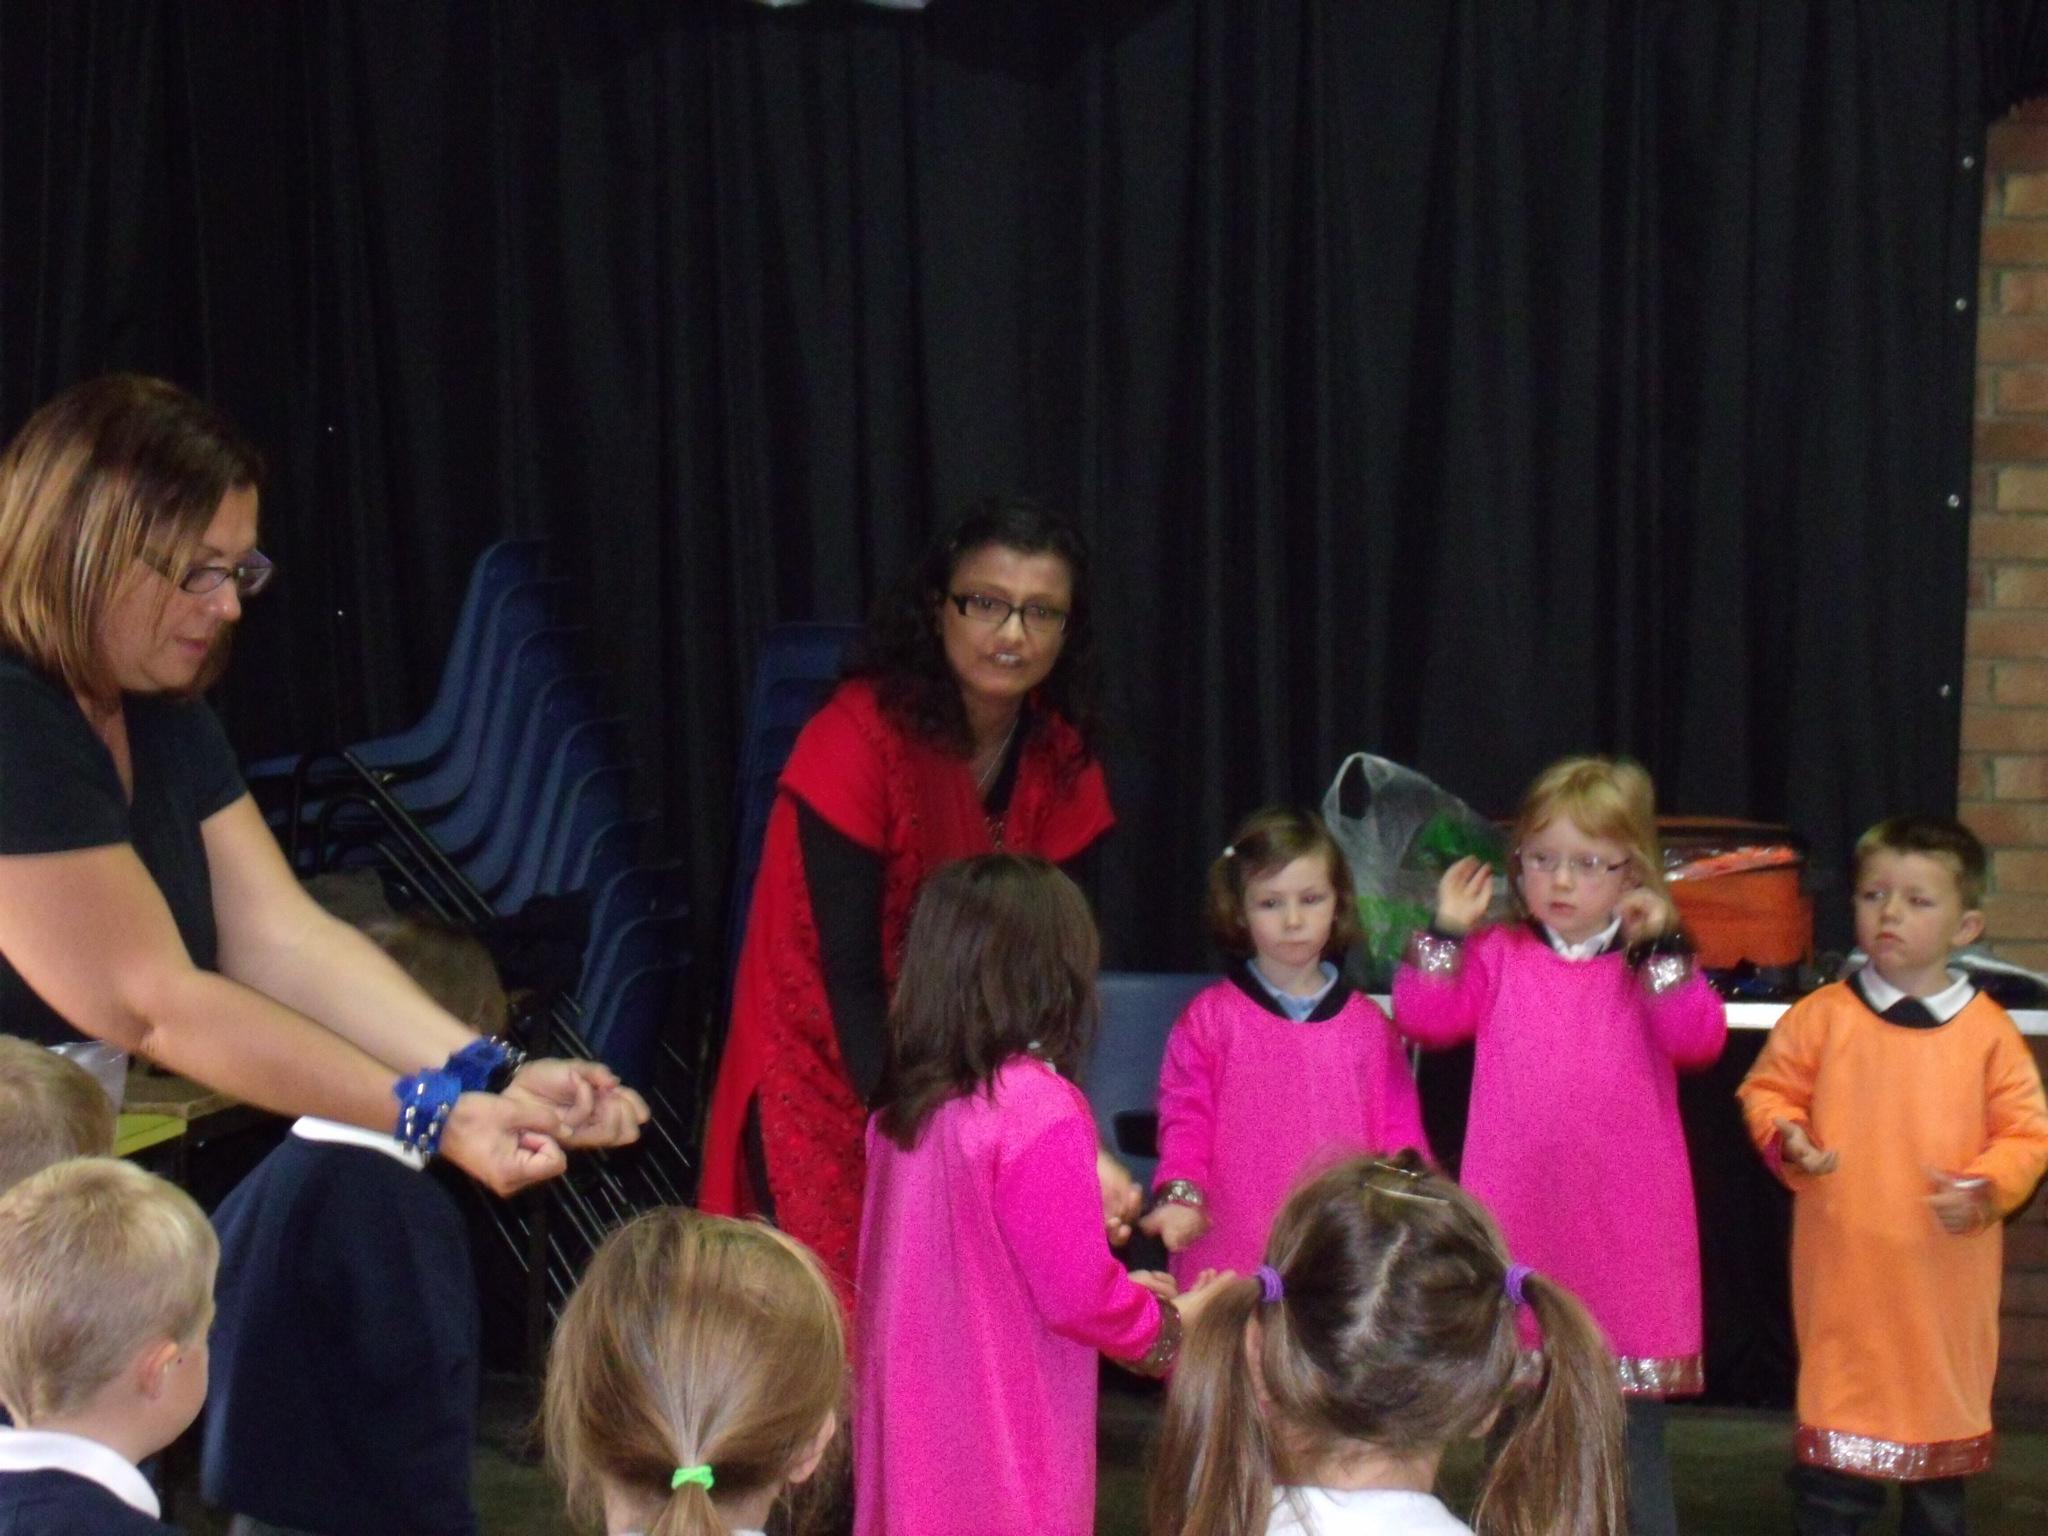 Children being taught Indian dance by teacher